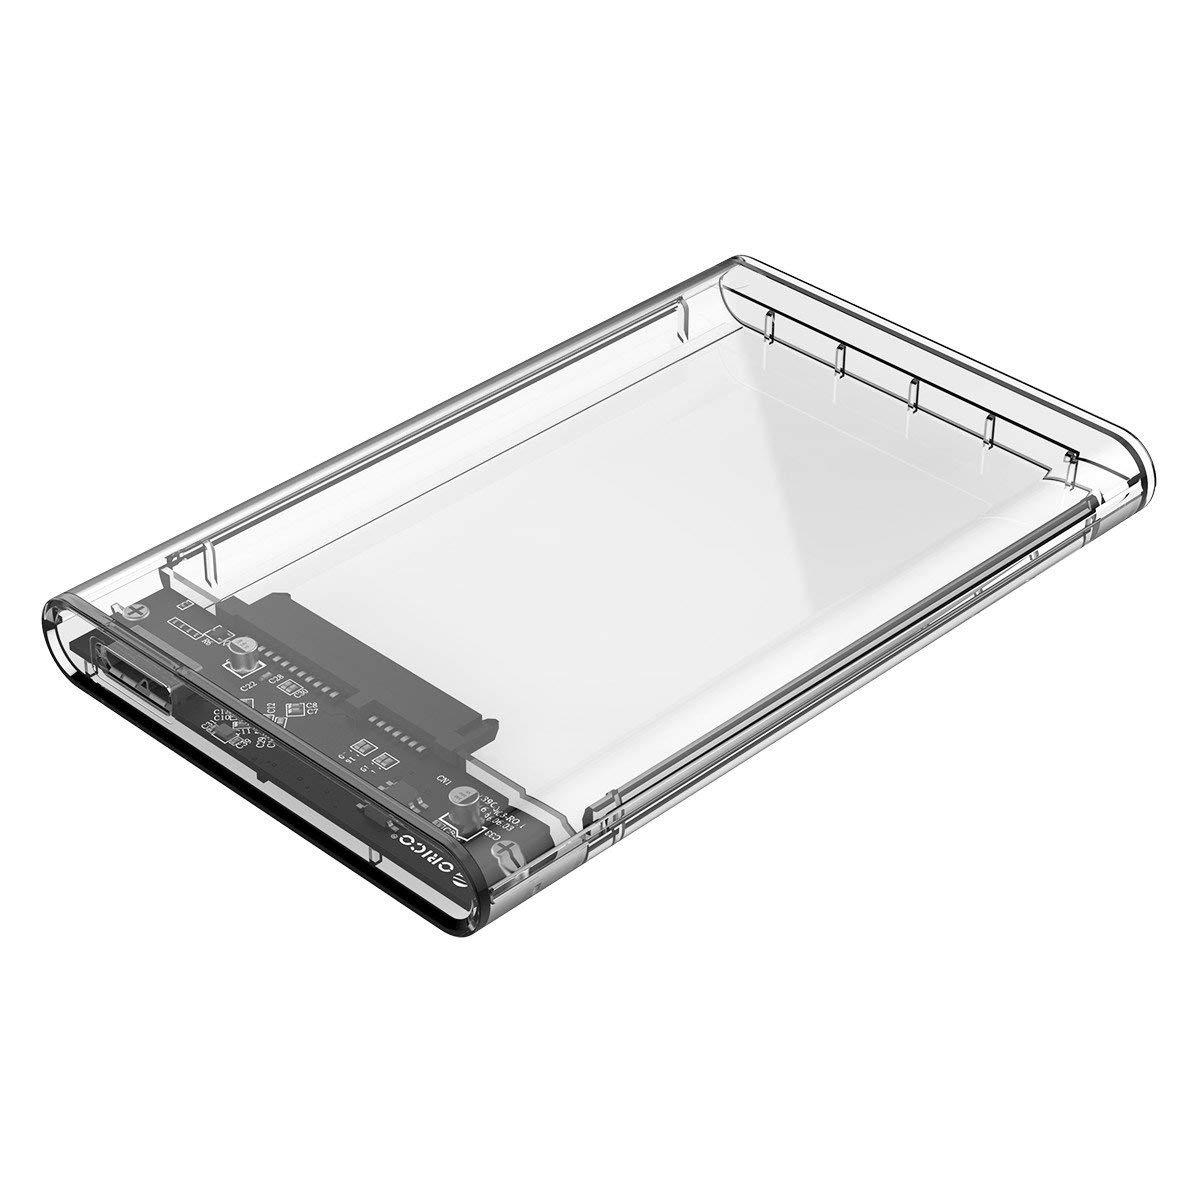 Orico External USB 3.0 SSD case